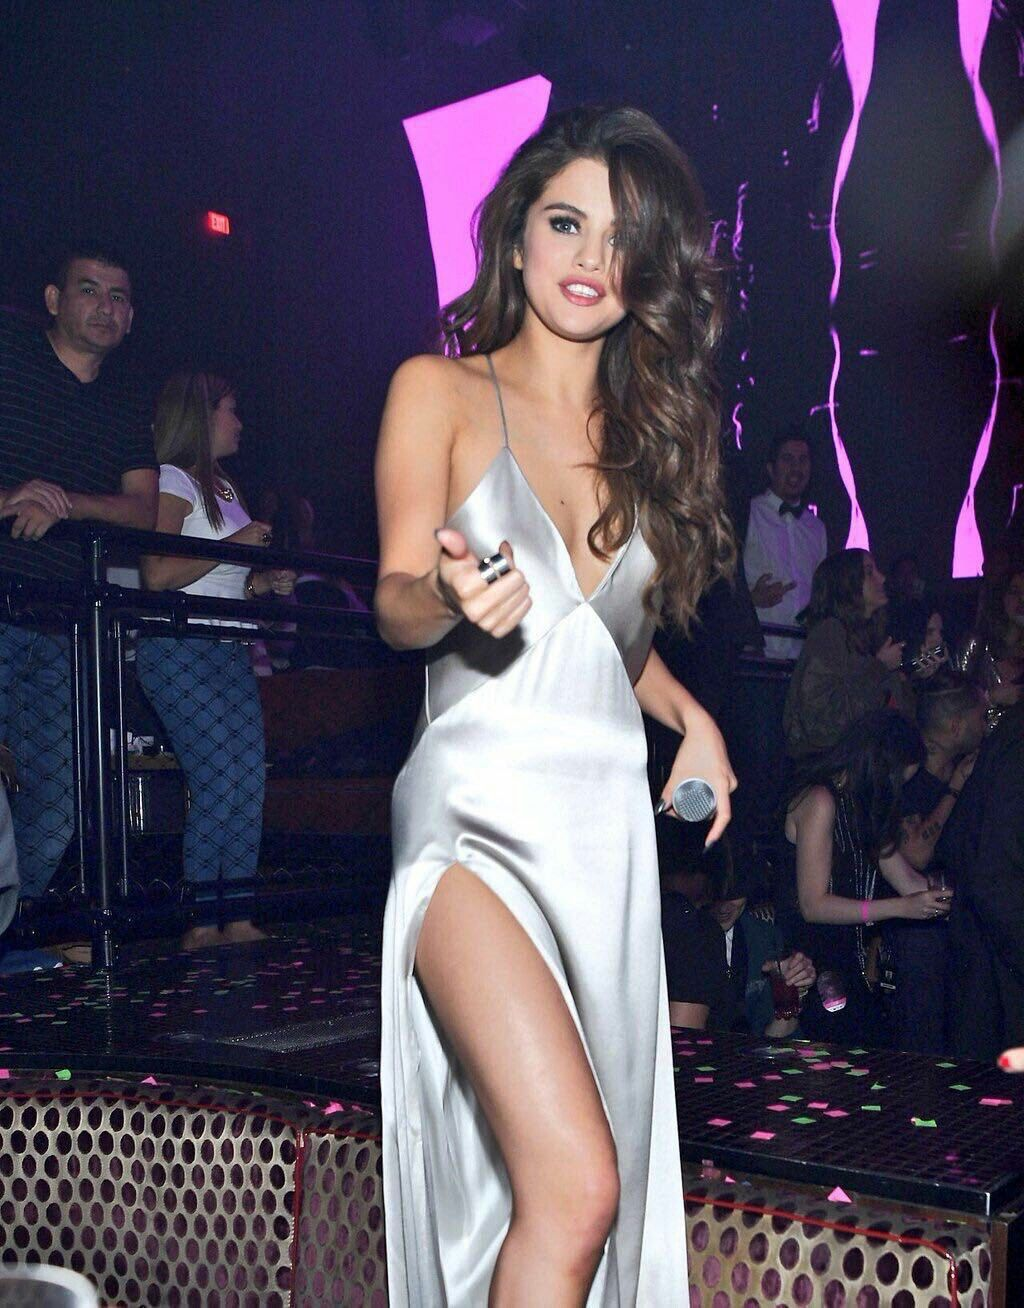 Pin by Tessa on Selena Diosa Gomez | Selena gomez dress ...